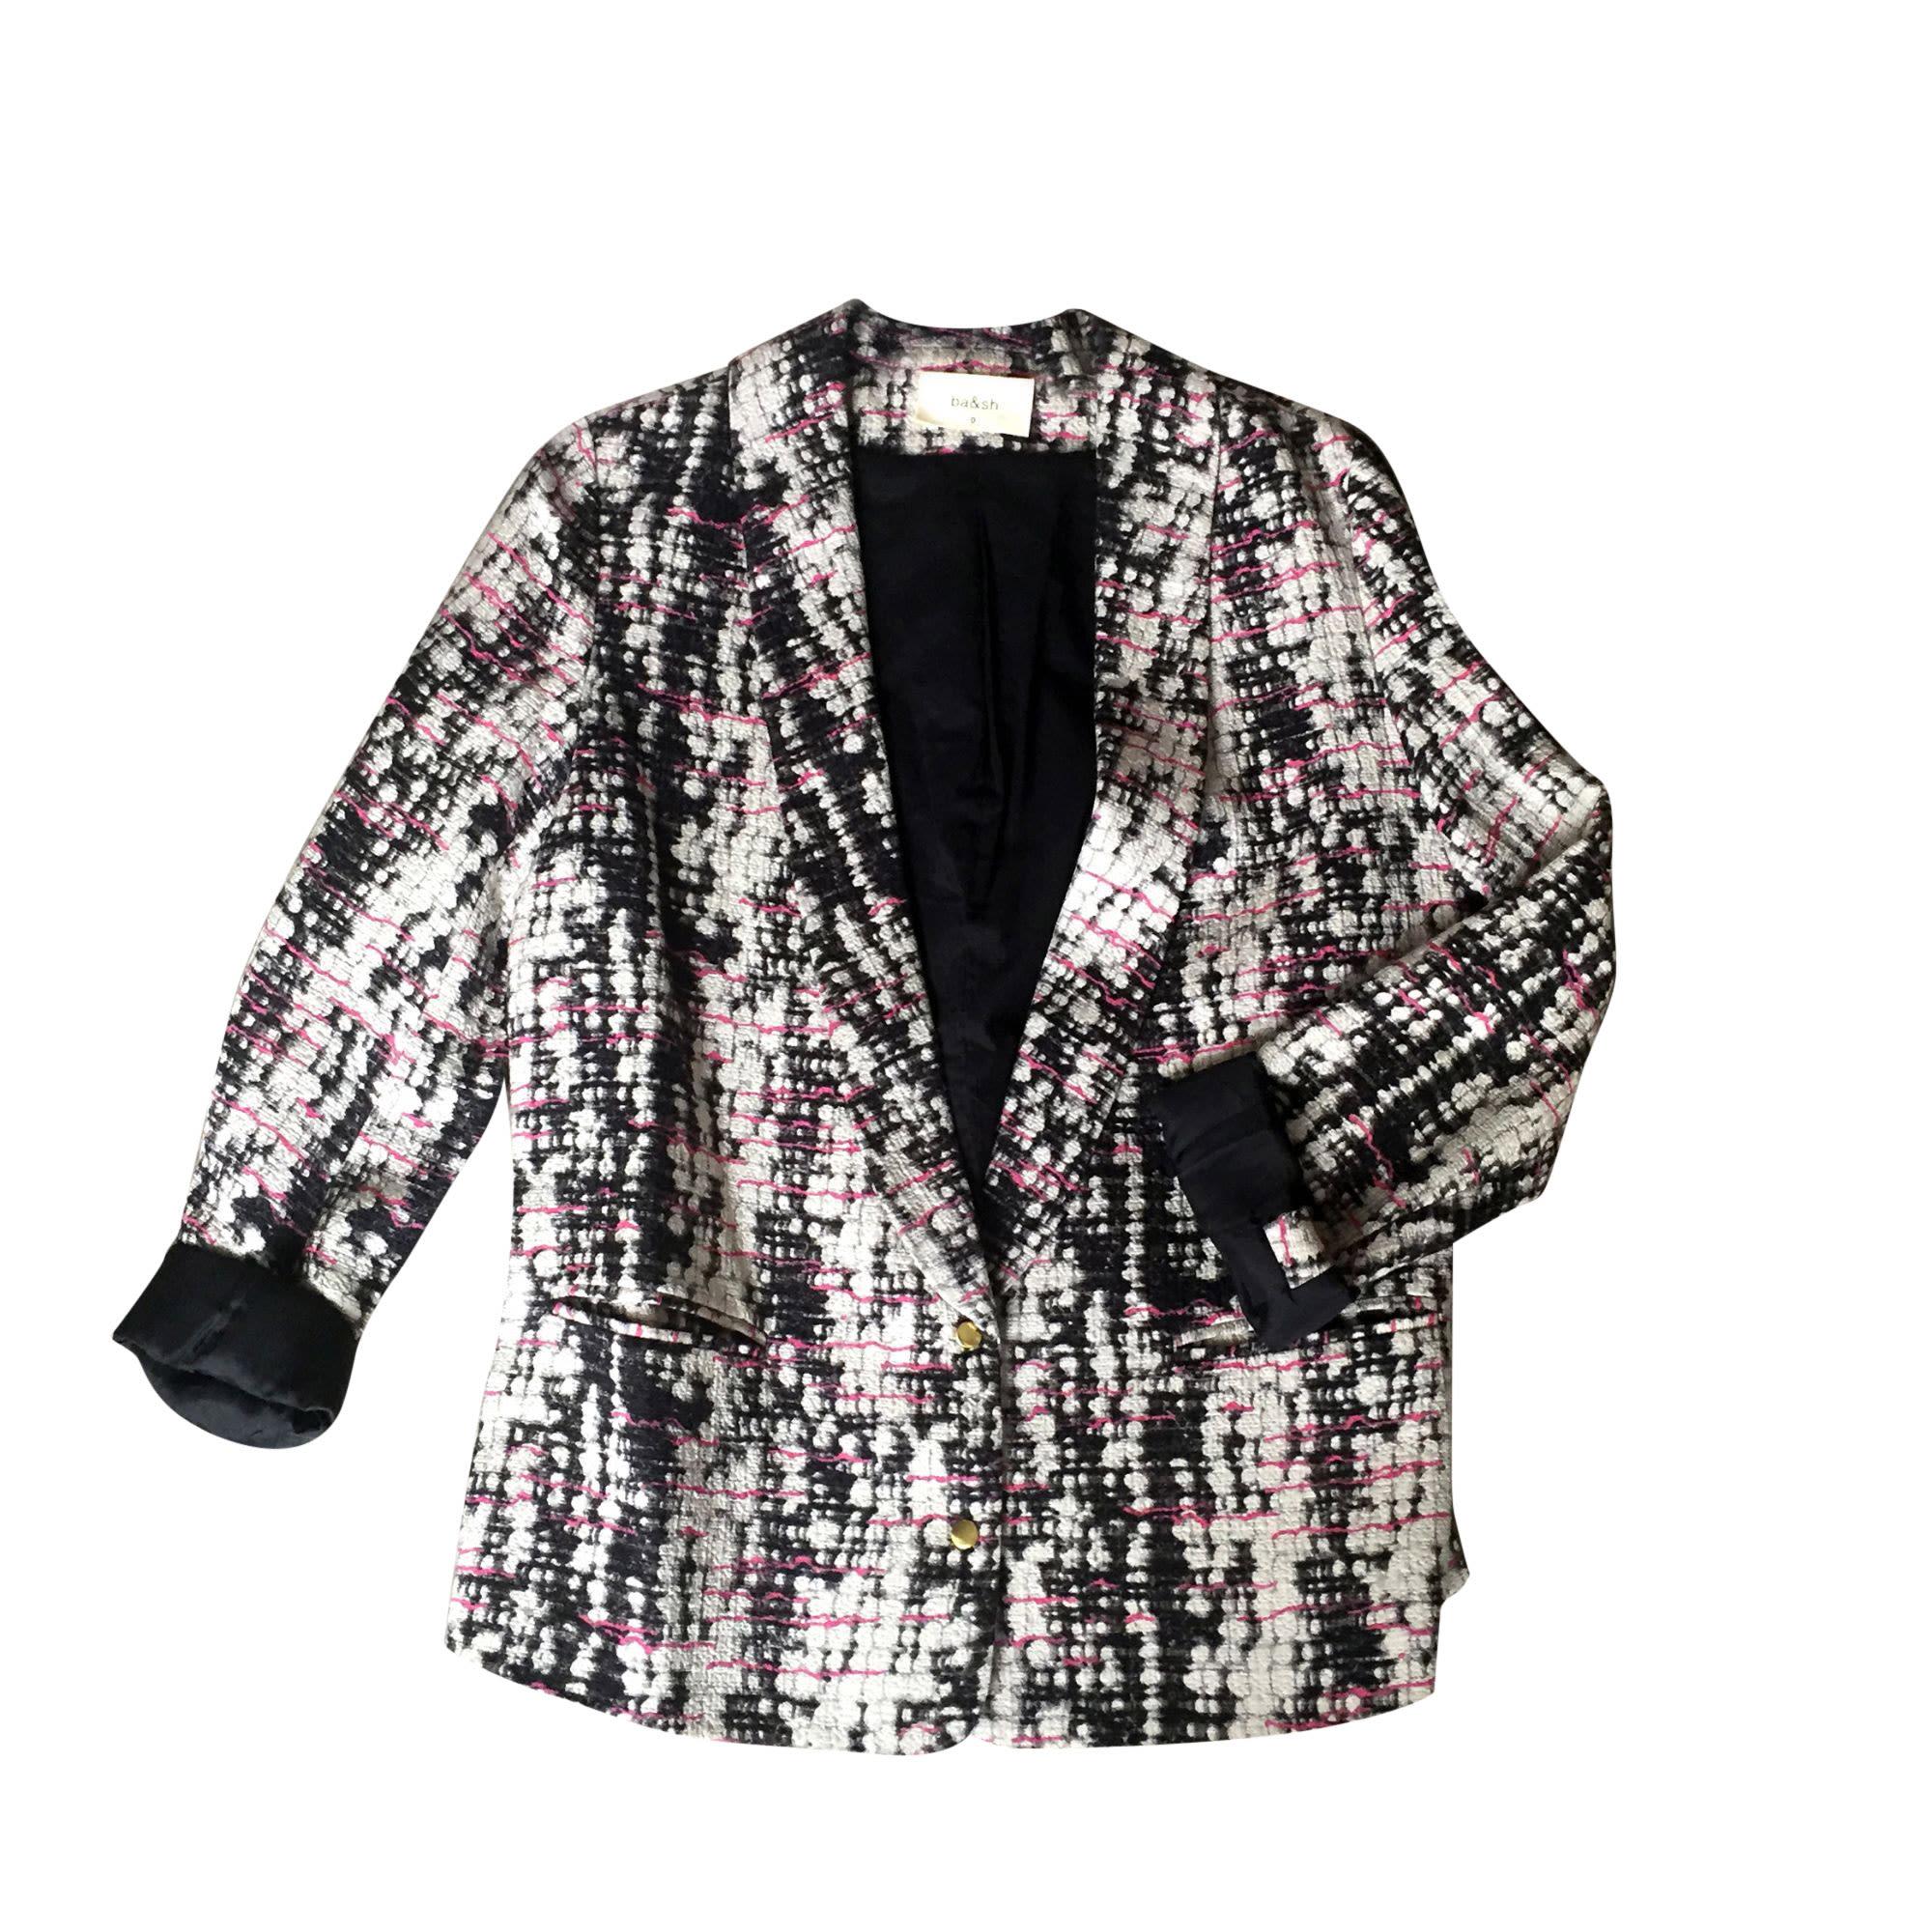 Veste BA&SH noir blanc  et rose fushia